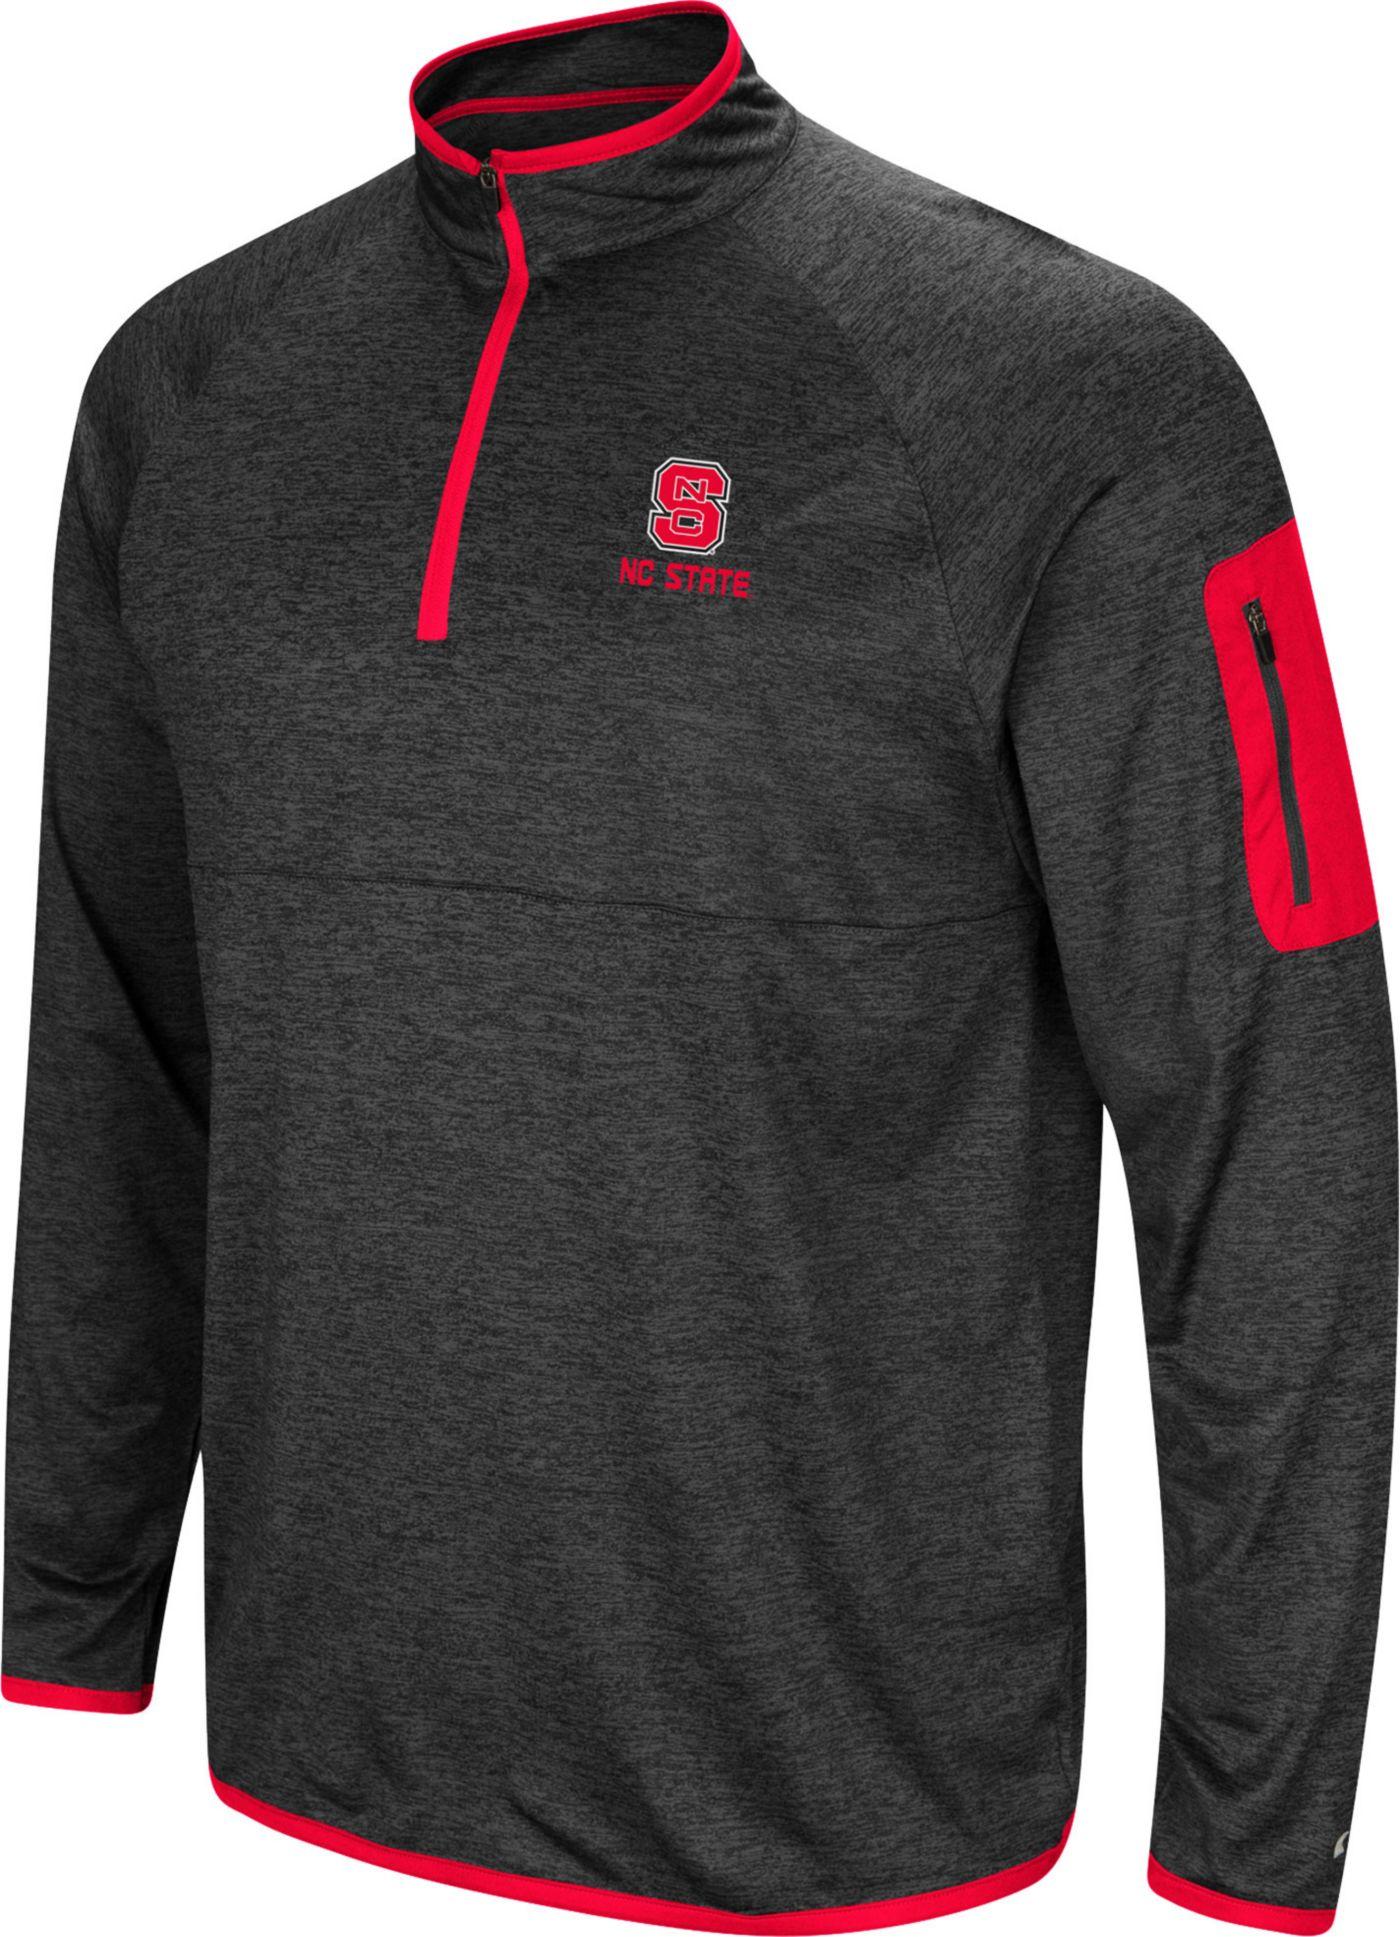 Colosseum Men's NC State Wolfpack Grey Indus River Quarter-Zip Shirt